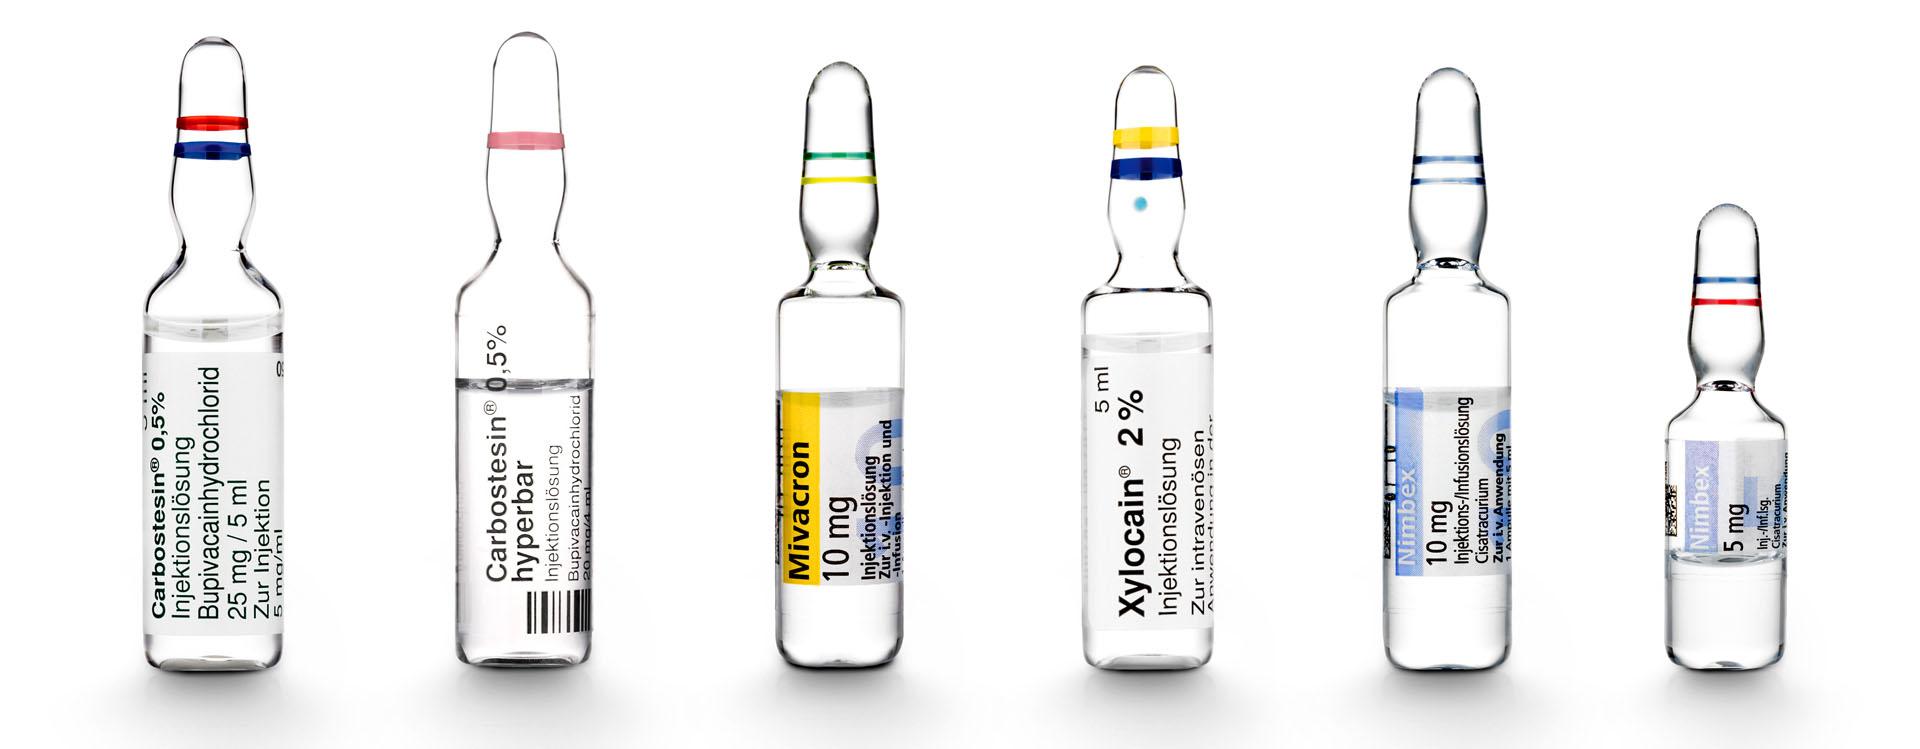 pharma werbung wegener aspen pharma packshots rendering